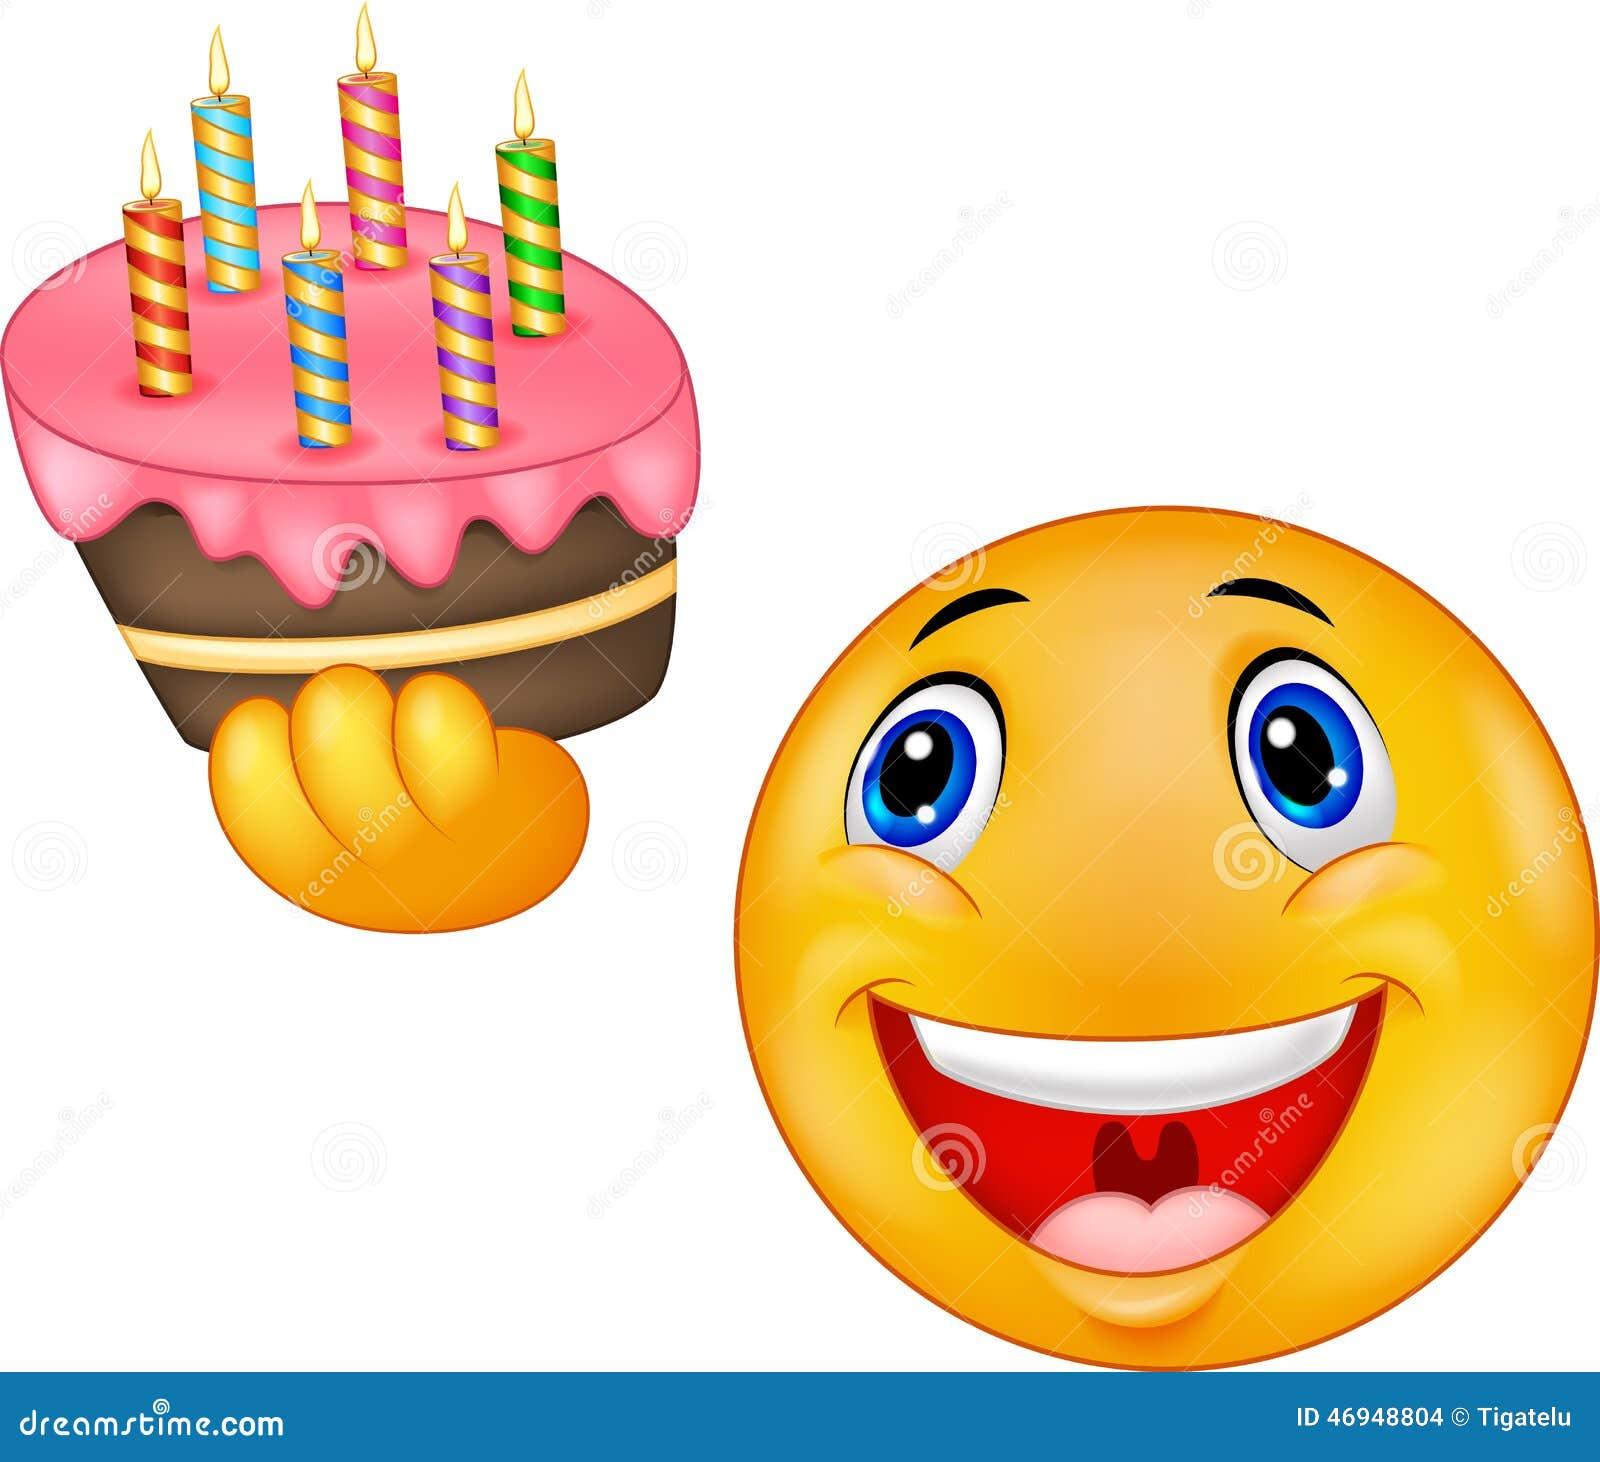 Illustration Of Smiley Emoticon Holding Birthday Cake